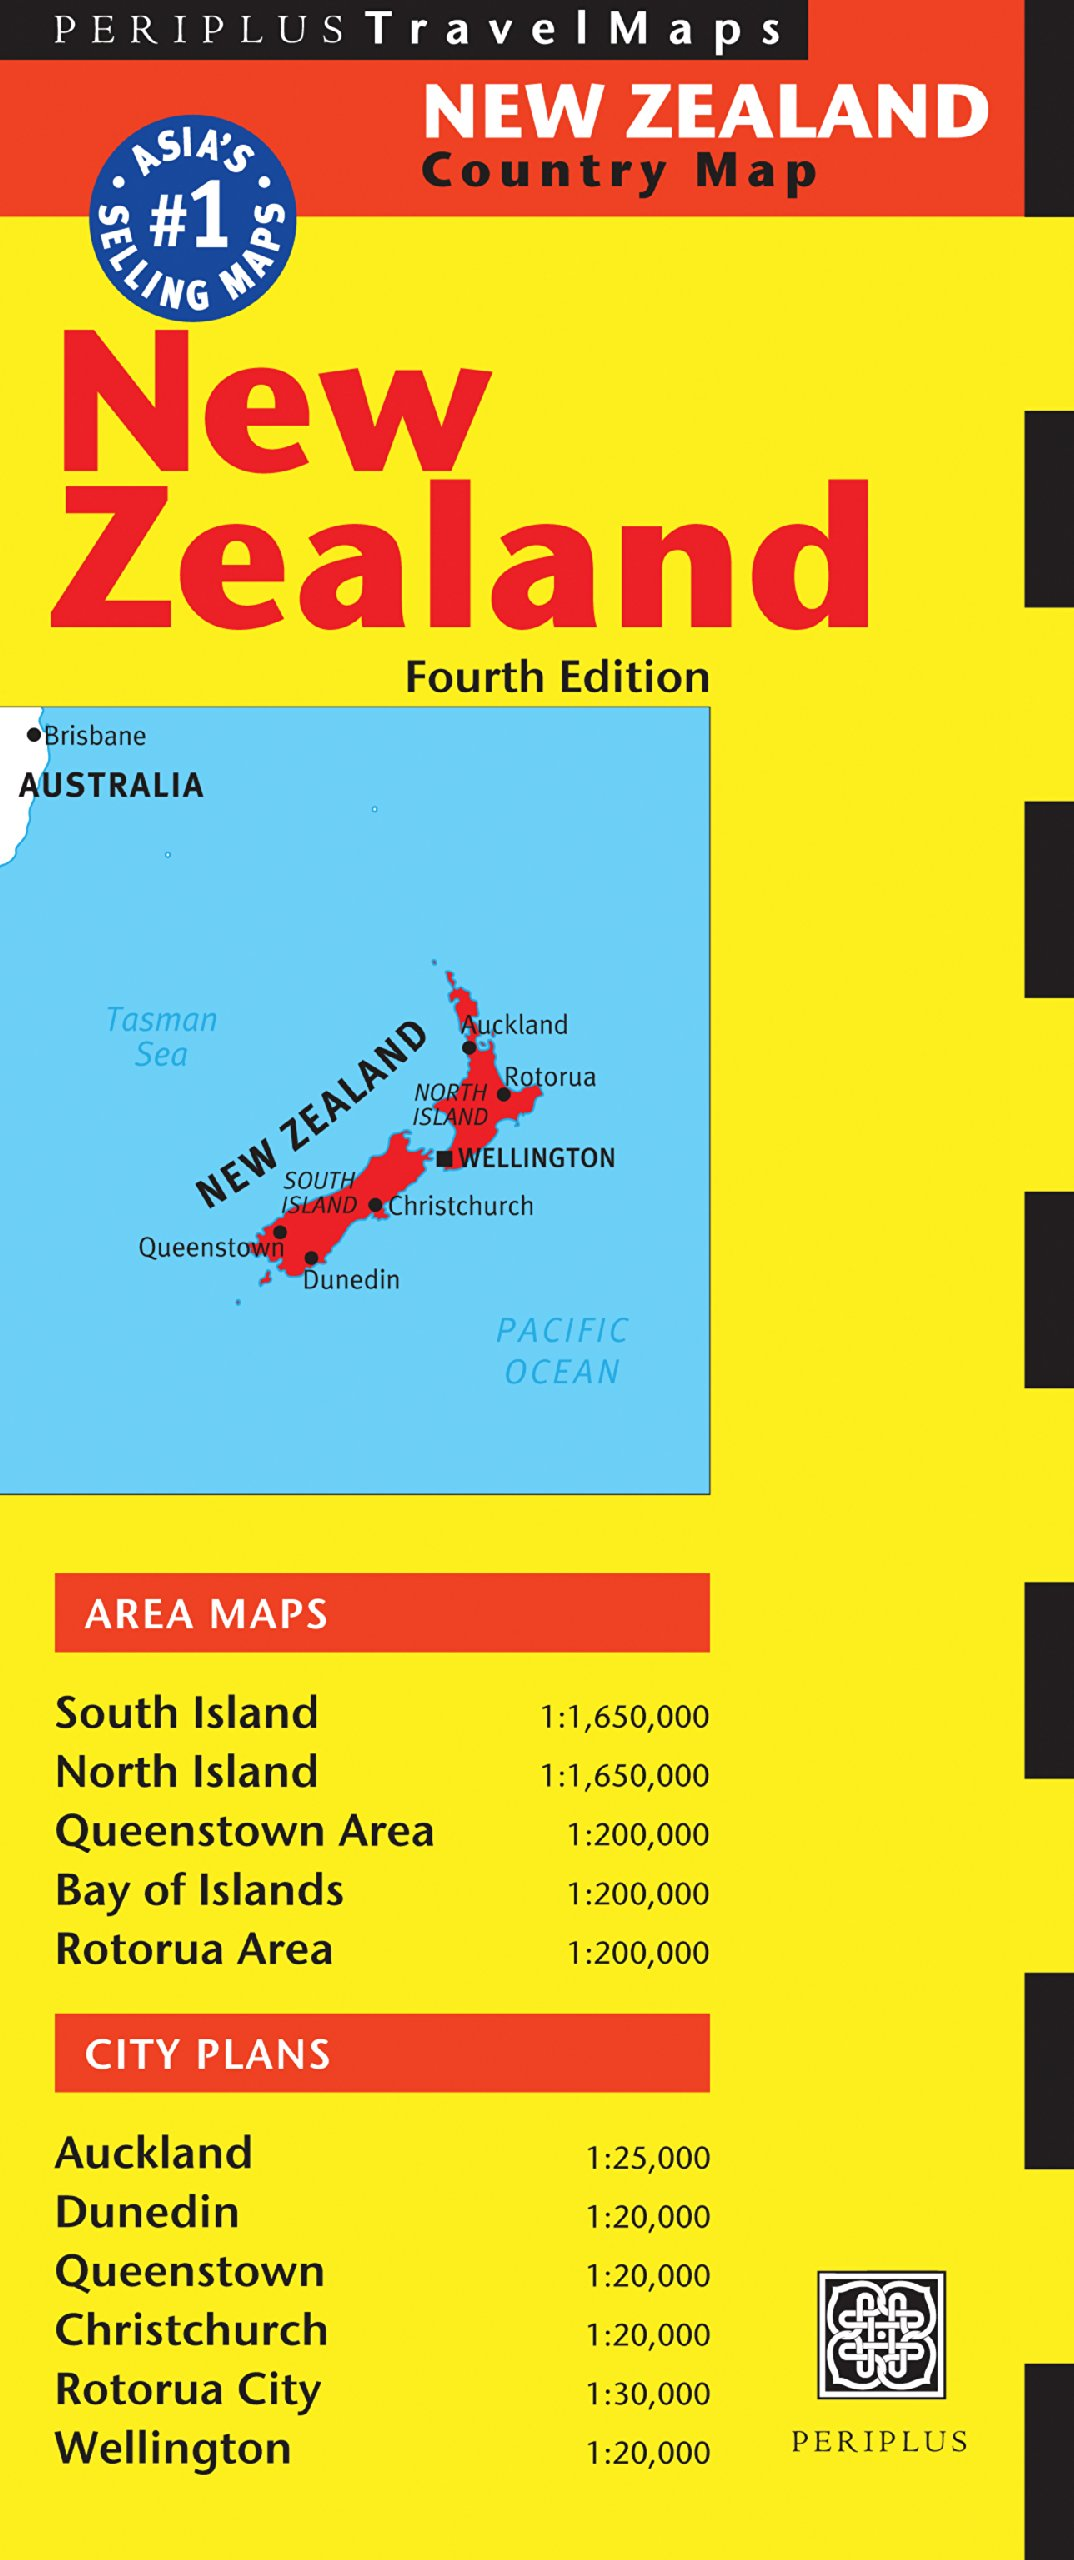 Travel Map New Zealand.New Zealand Travel Map Fourth Edition Australia Regional Maps